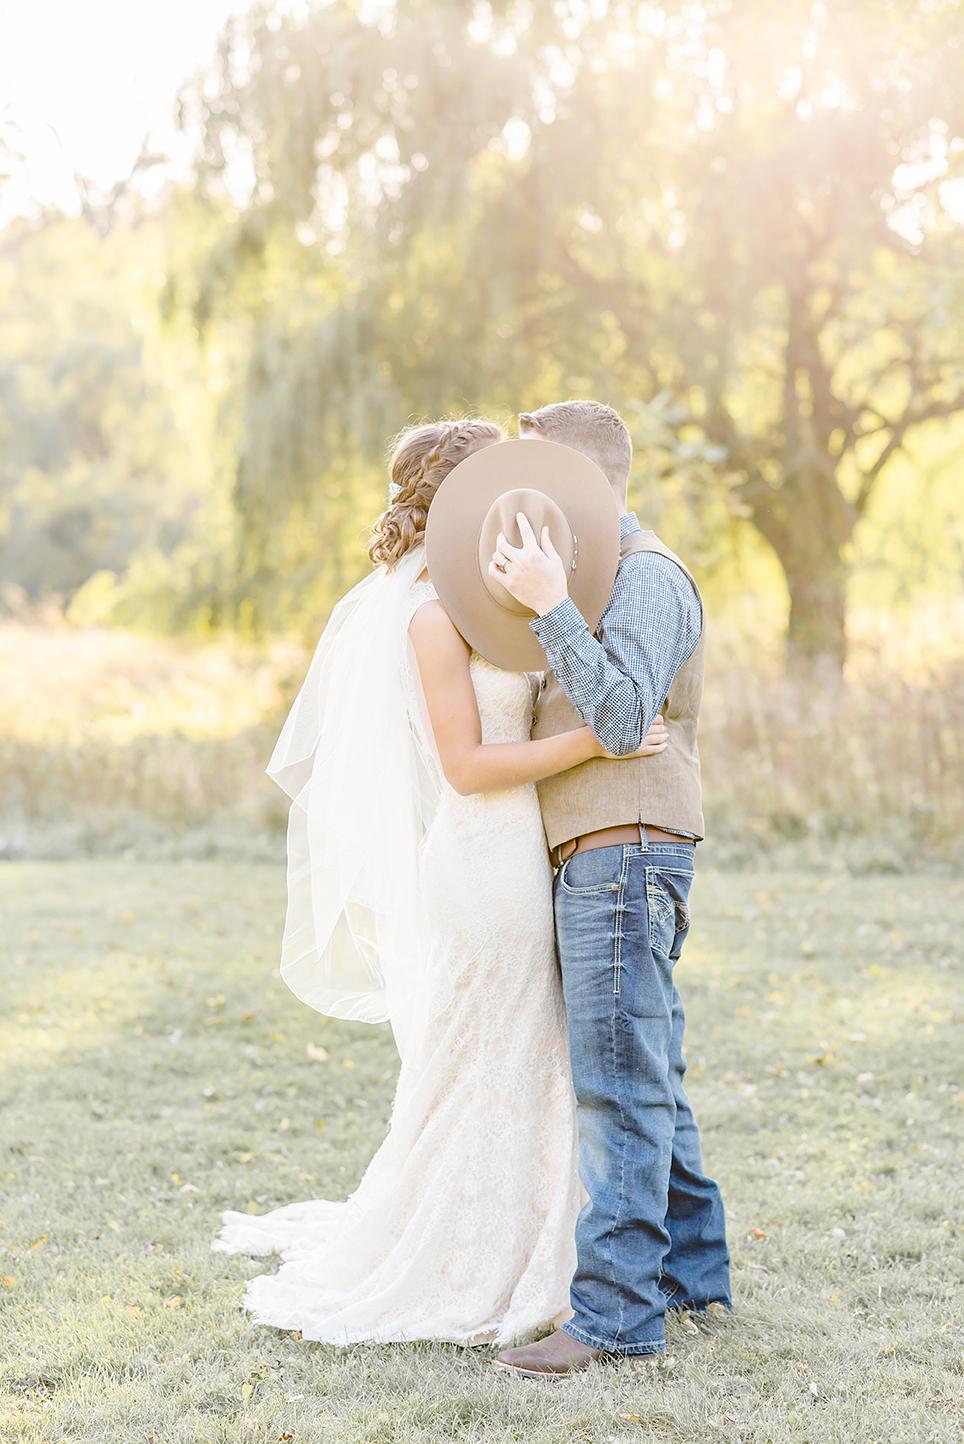 MICHIGAN-WEDDING-PHOTOGRAPHER-MICHIGAN-WEDDING-PHOTOGRAPHY-HERITAGE-PARK-ADRIAN-MICHIGAN